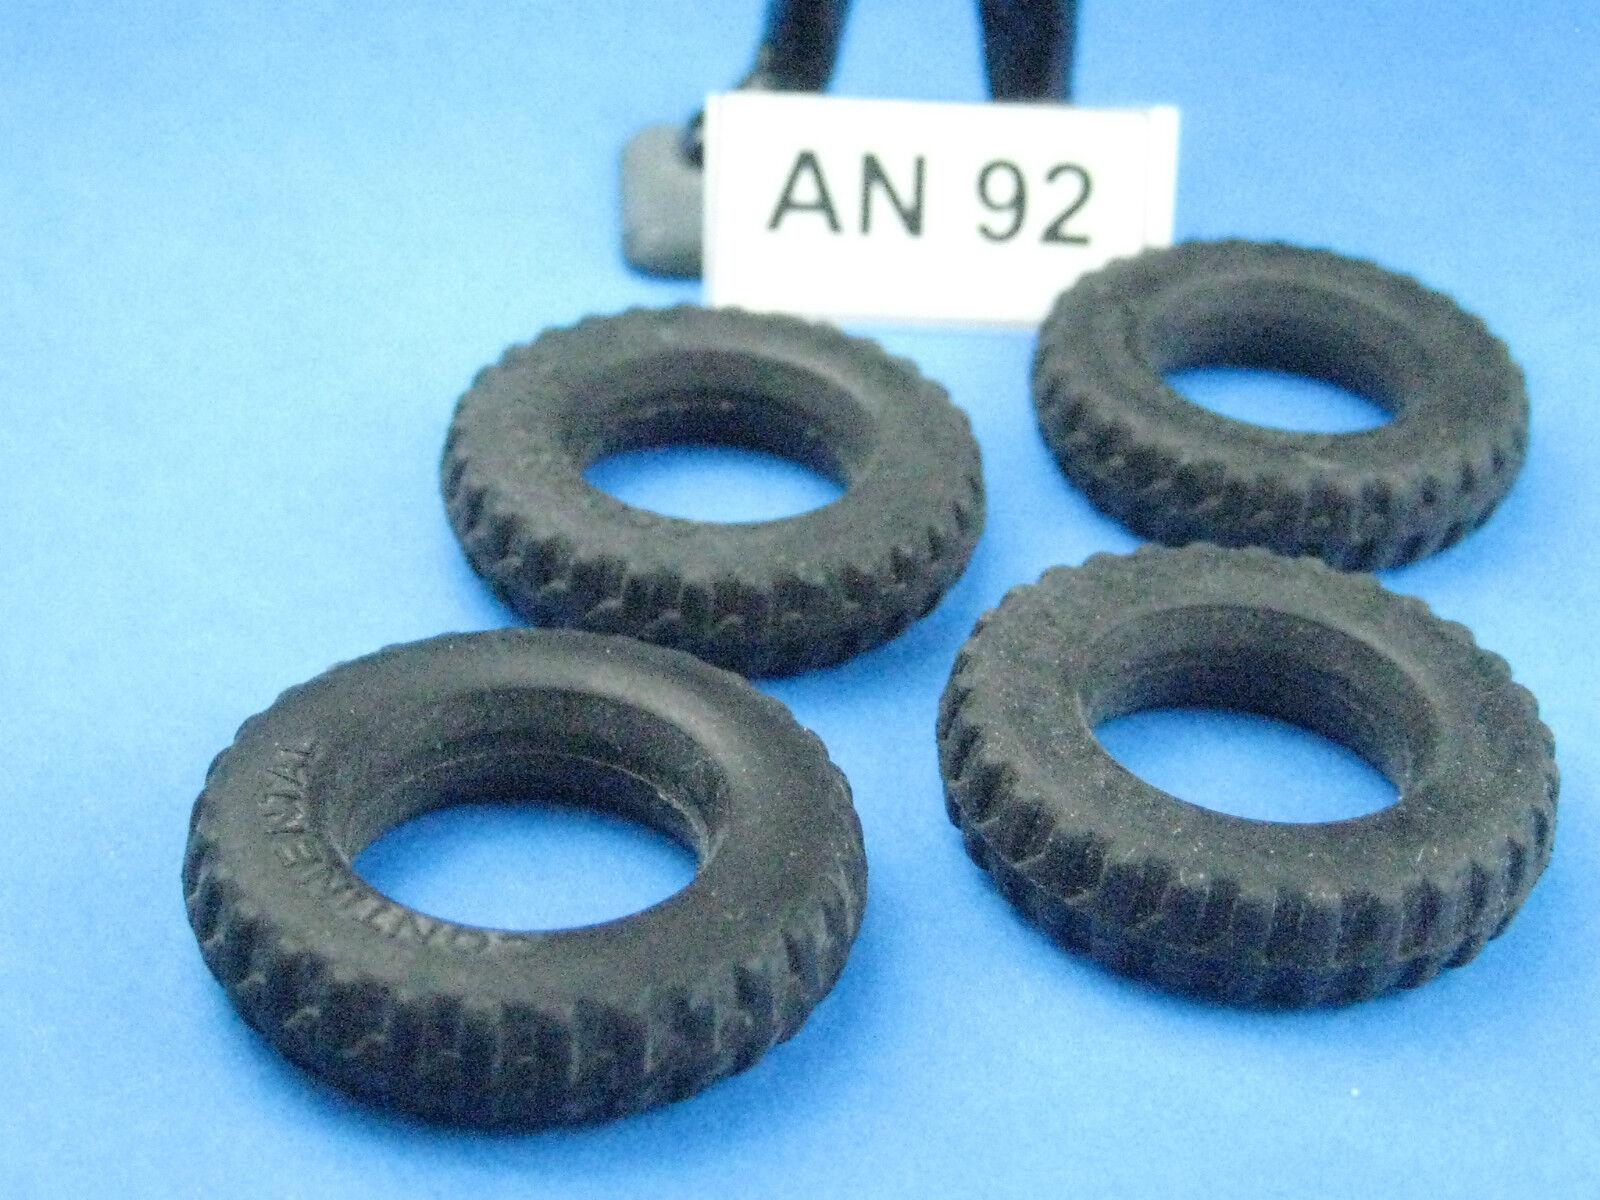 Gonio pezzo di Ø ricambio: 4 pneumatici in gomma Ø di 27 mm (an92) 6a3e8b